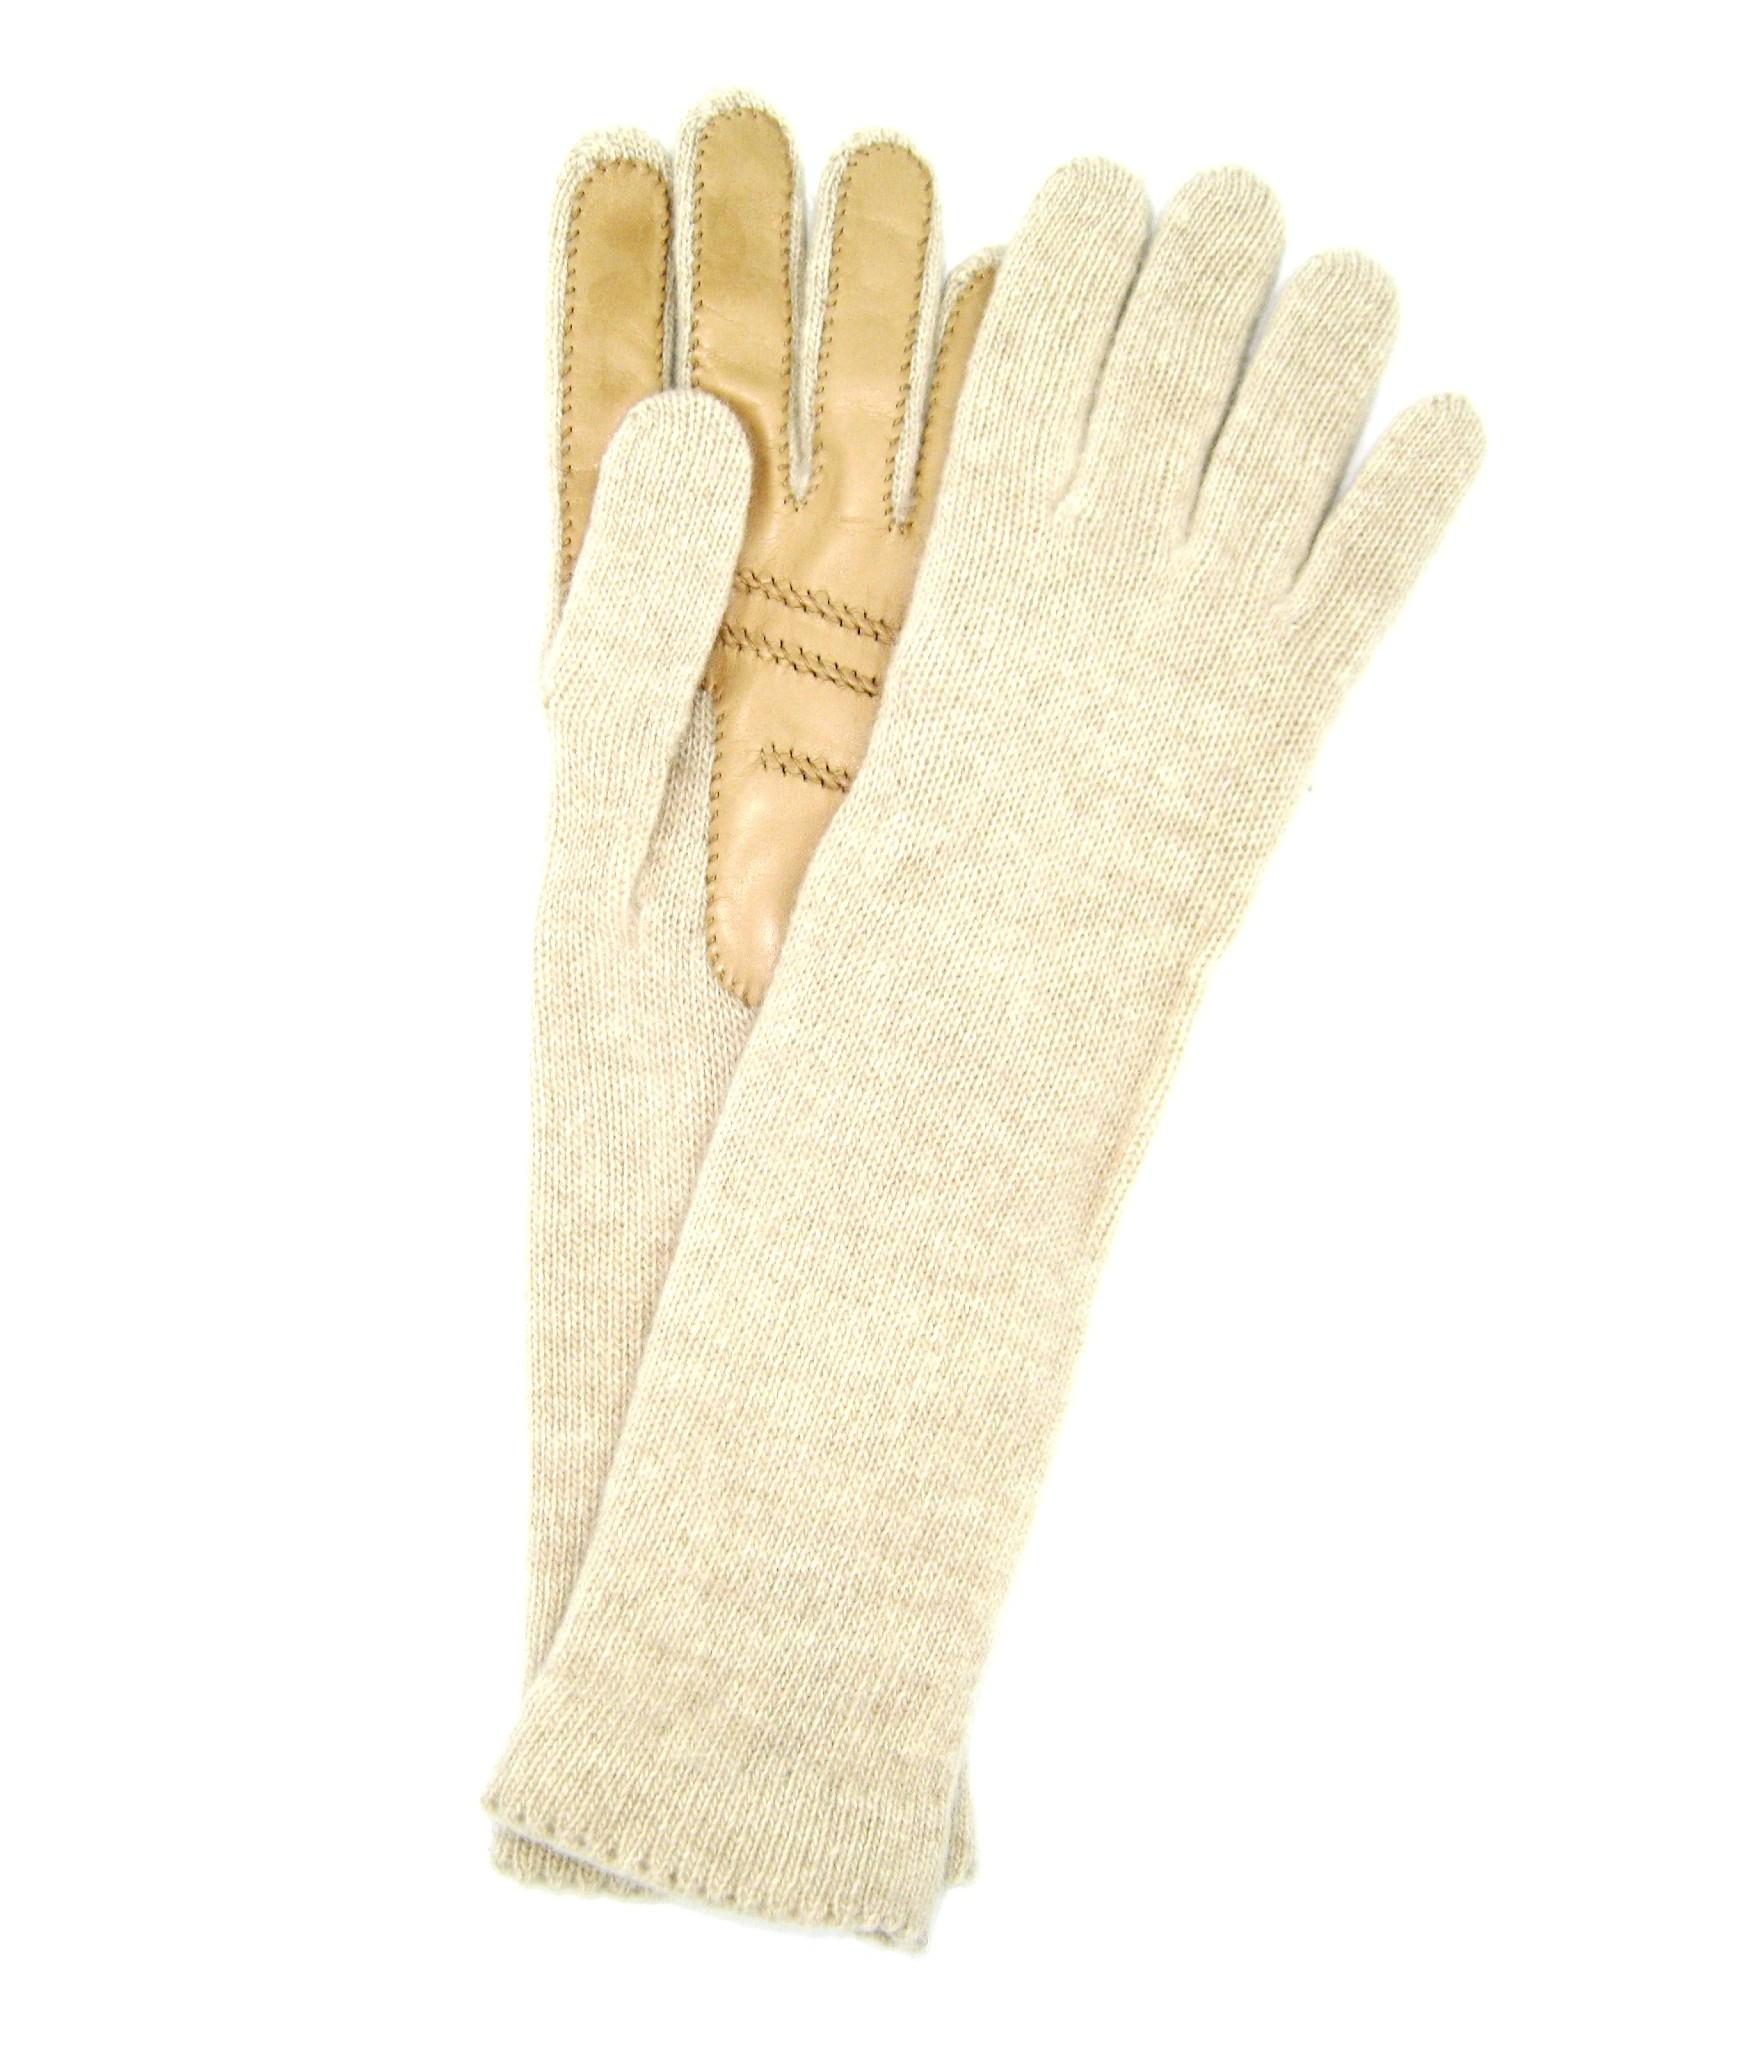 100%cashmere gloves 4BT with Nappa leather palm Cream Sermoneta